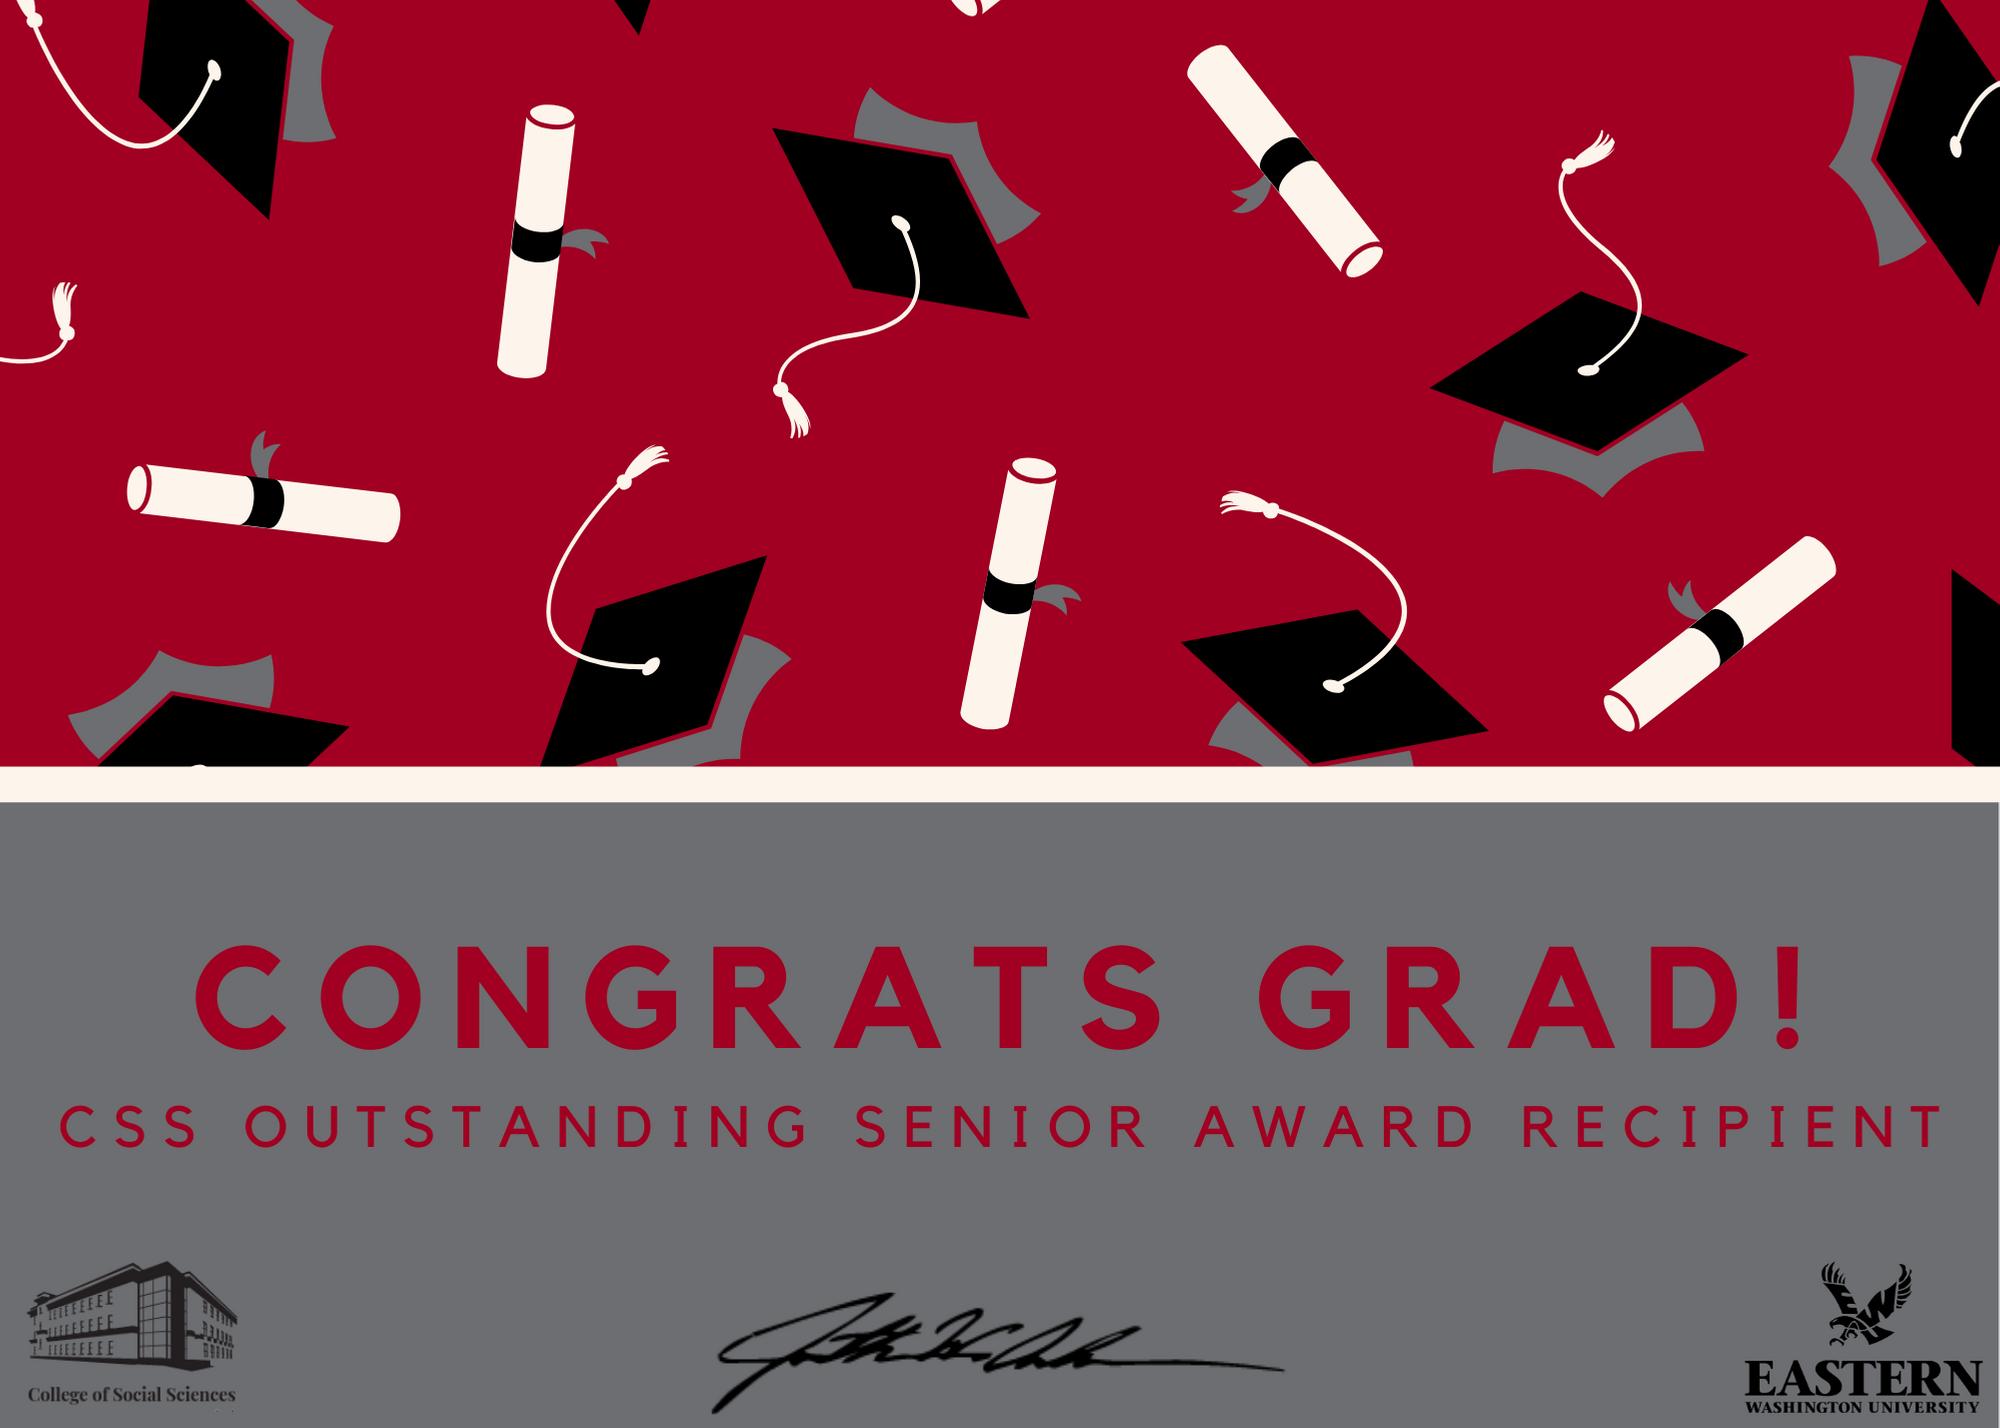 4157-caps-and-diplomas-pattern-graduation-card-2.png